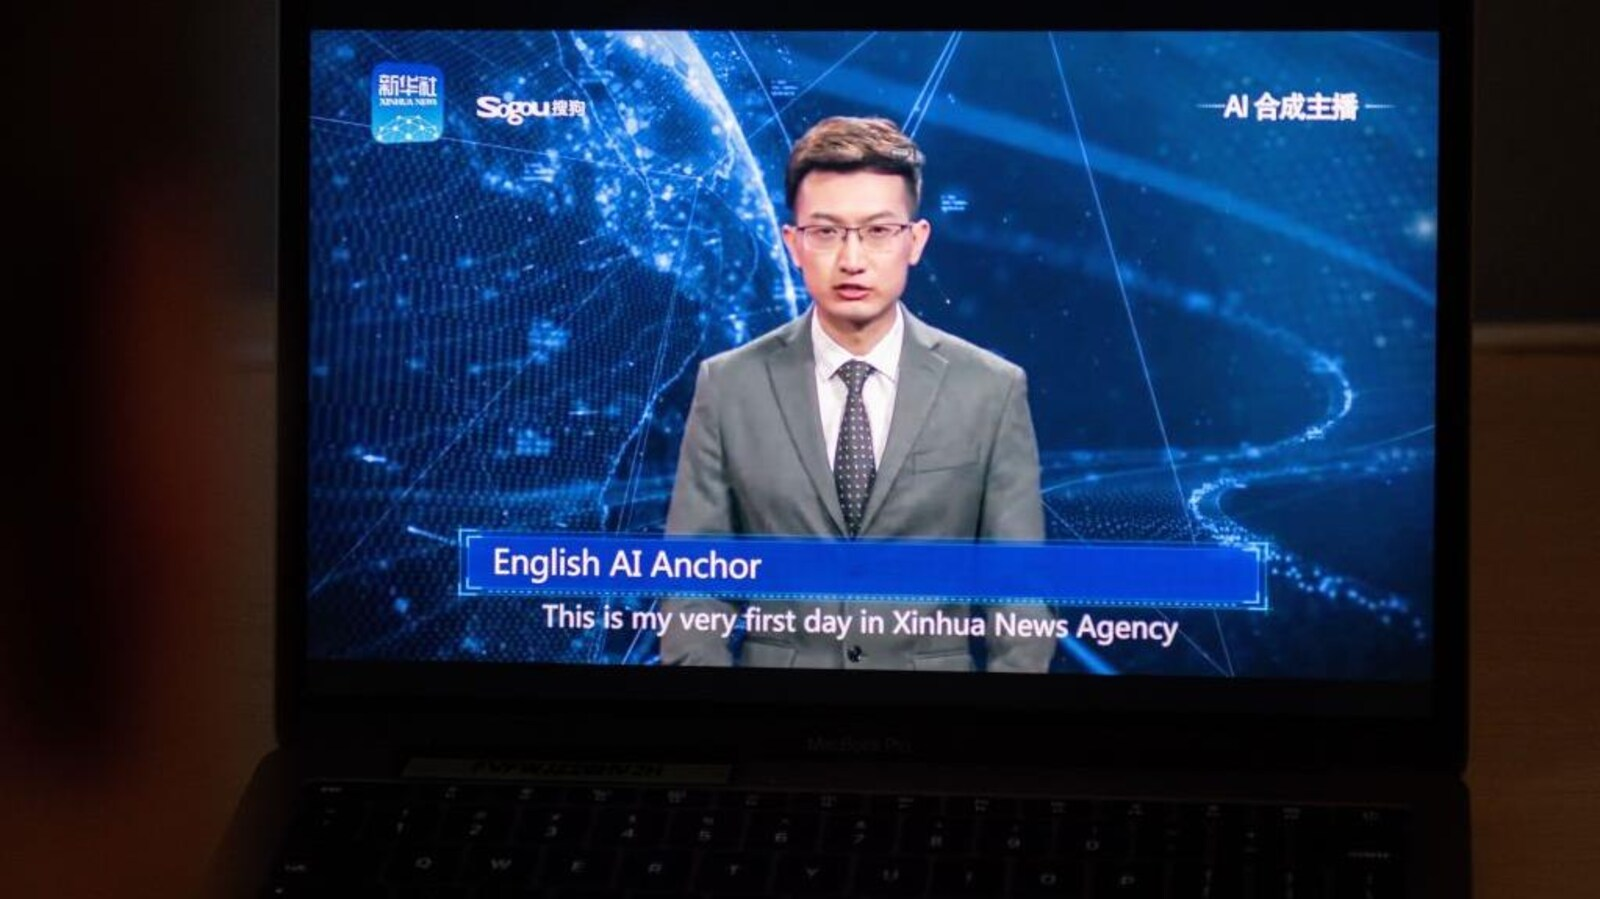 Les robots prêts à envahir le téléjournal en Chine   ICI.Radio-Canada.ca ca9f826f025f